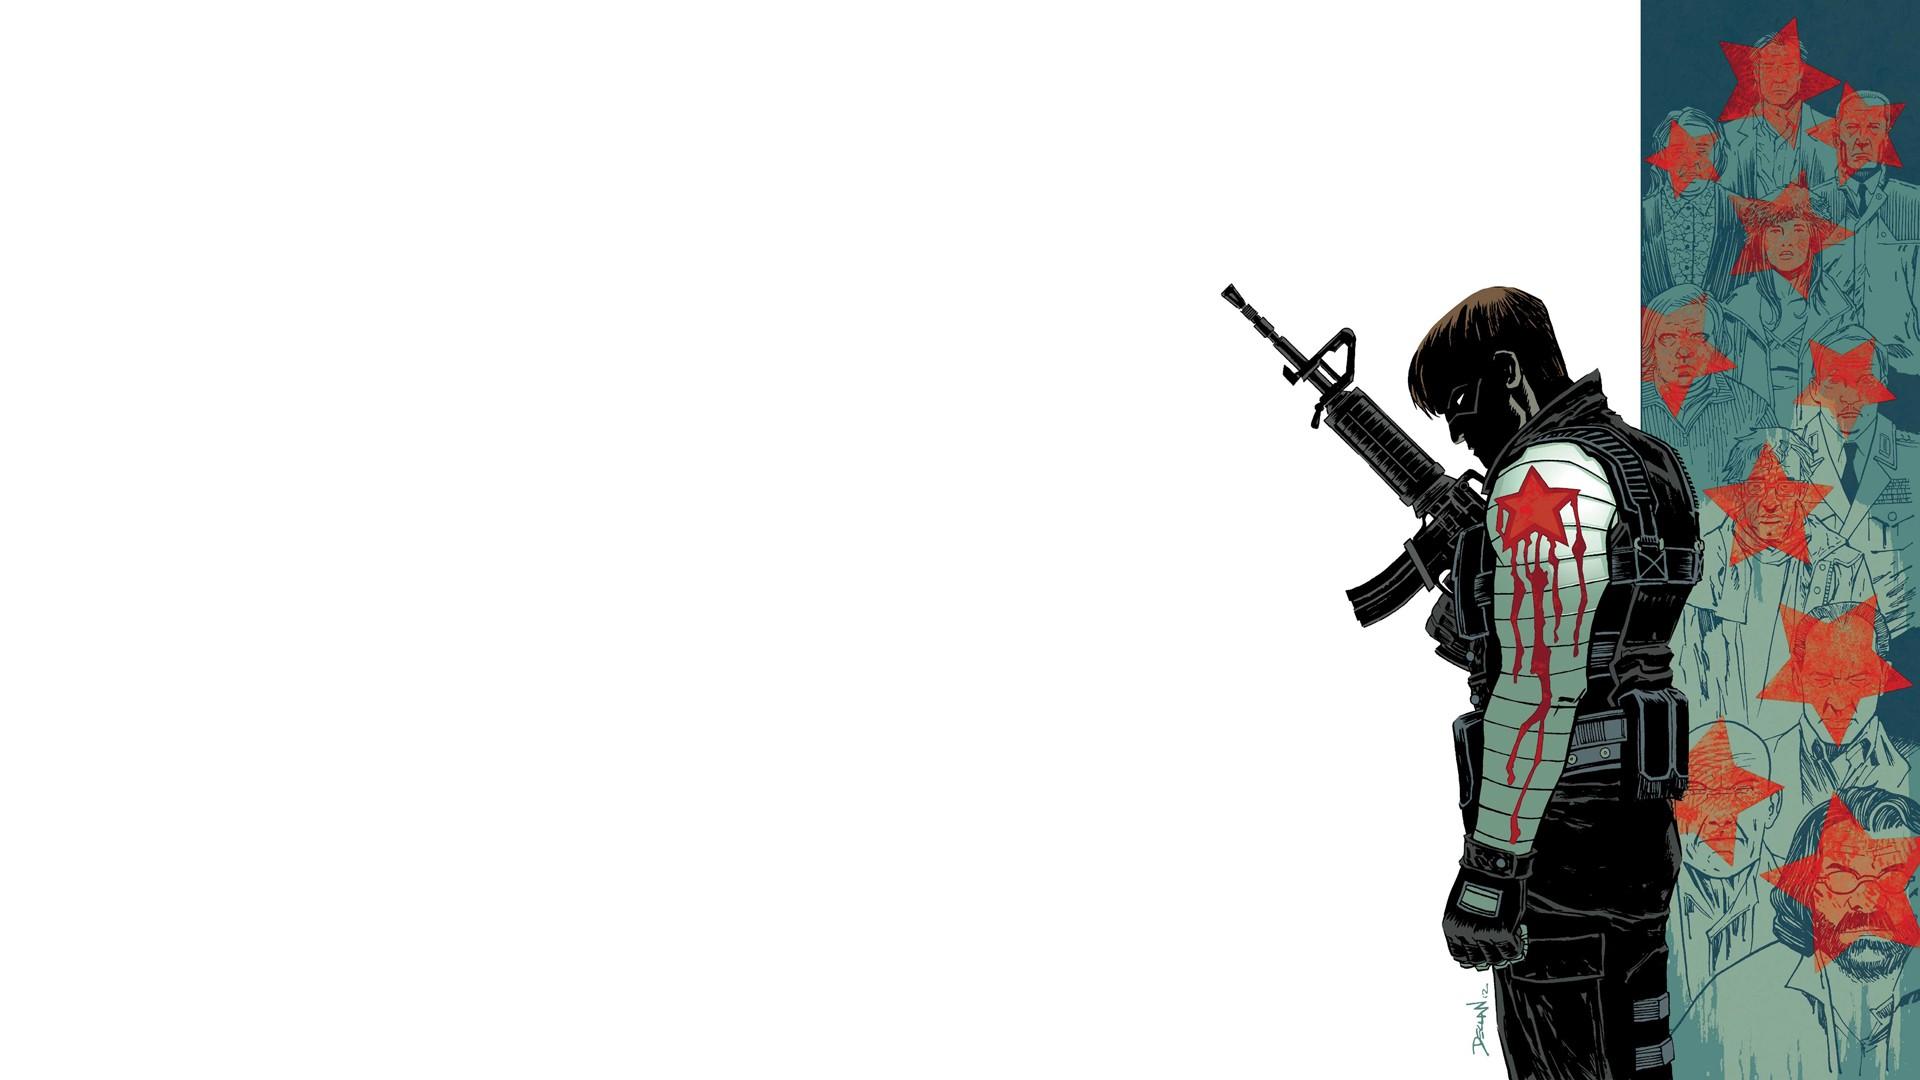 Comics Winter Soldier wallpaper   1920x1080   197022 ...